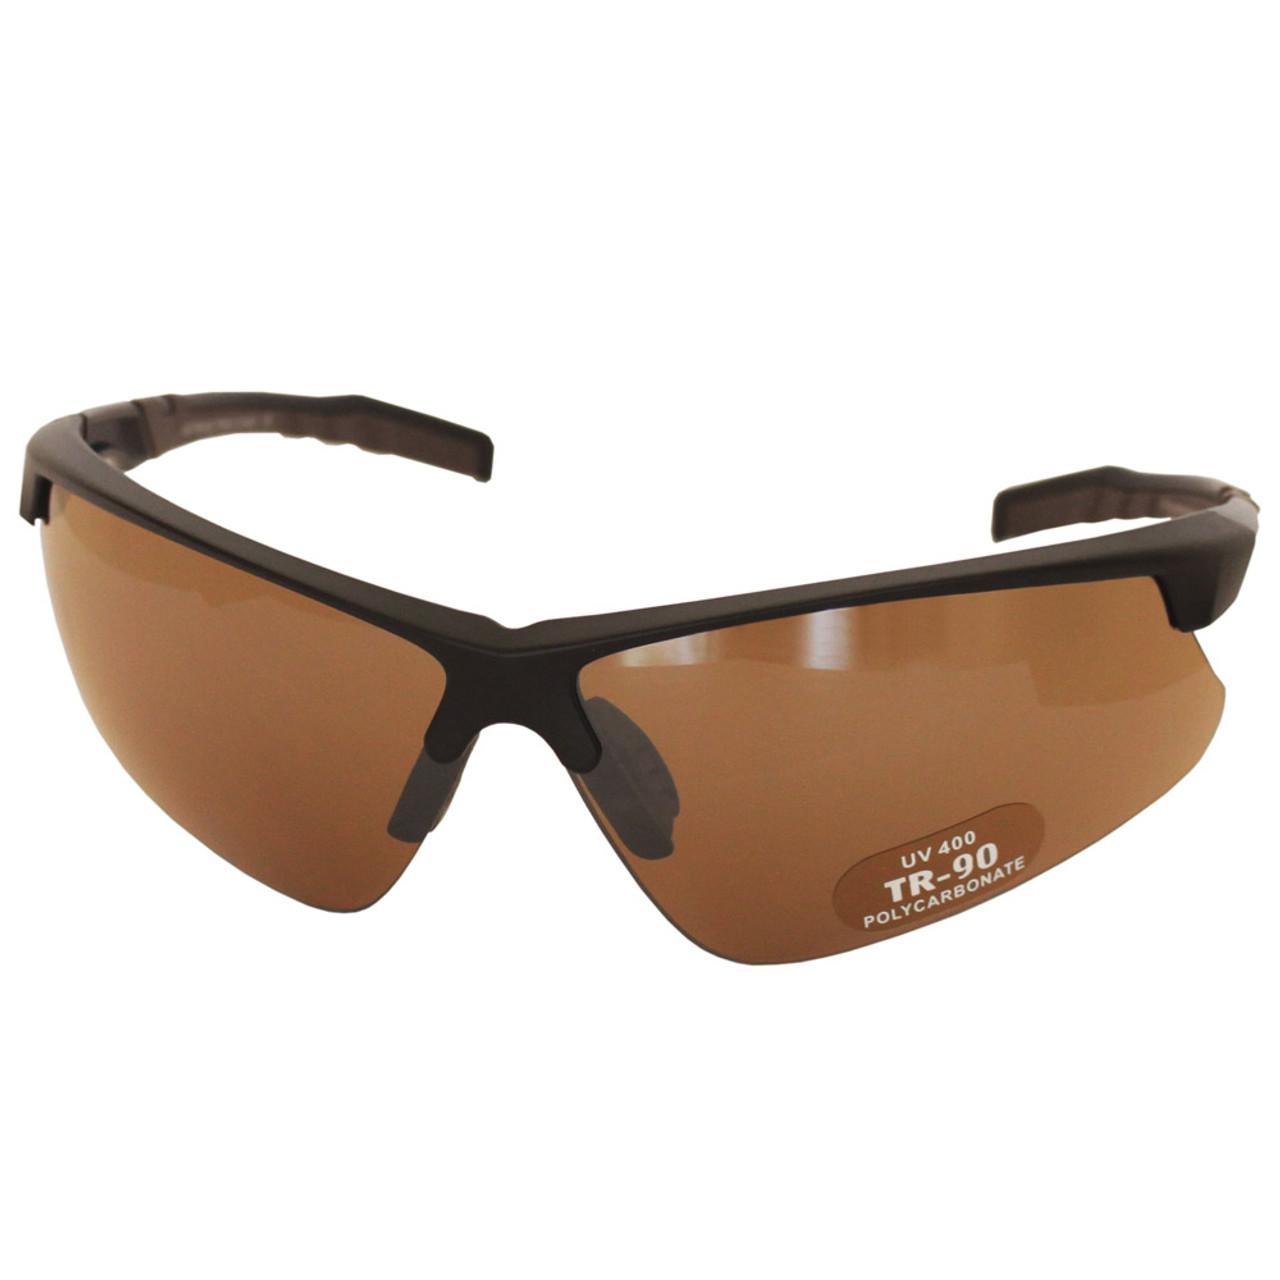 b31ff42e91 Tanel 360 T5 Baseball Softball Sunglasses - Tanel 360